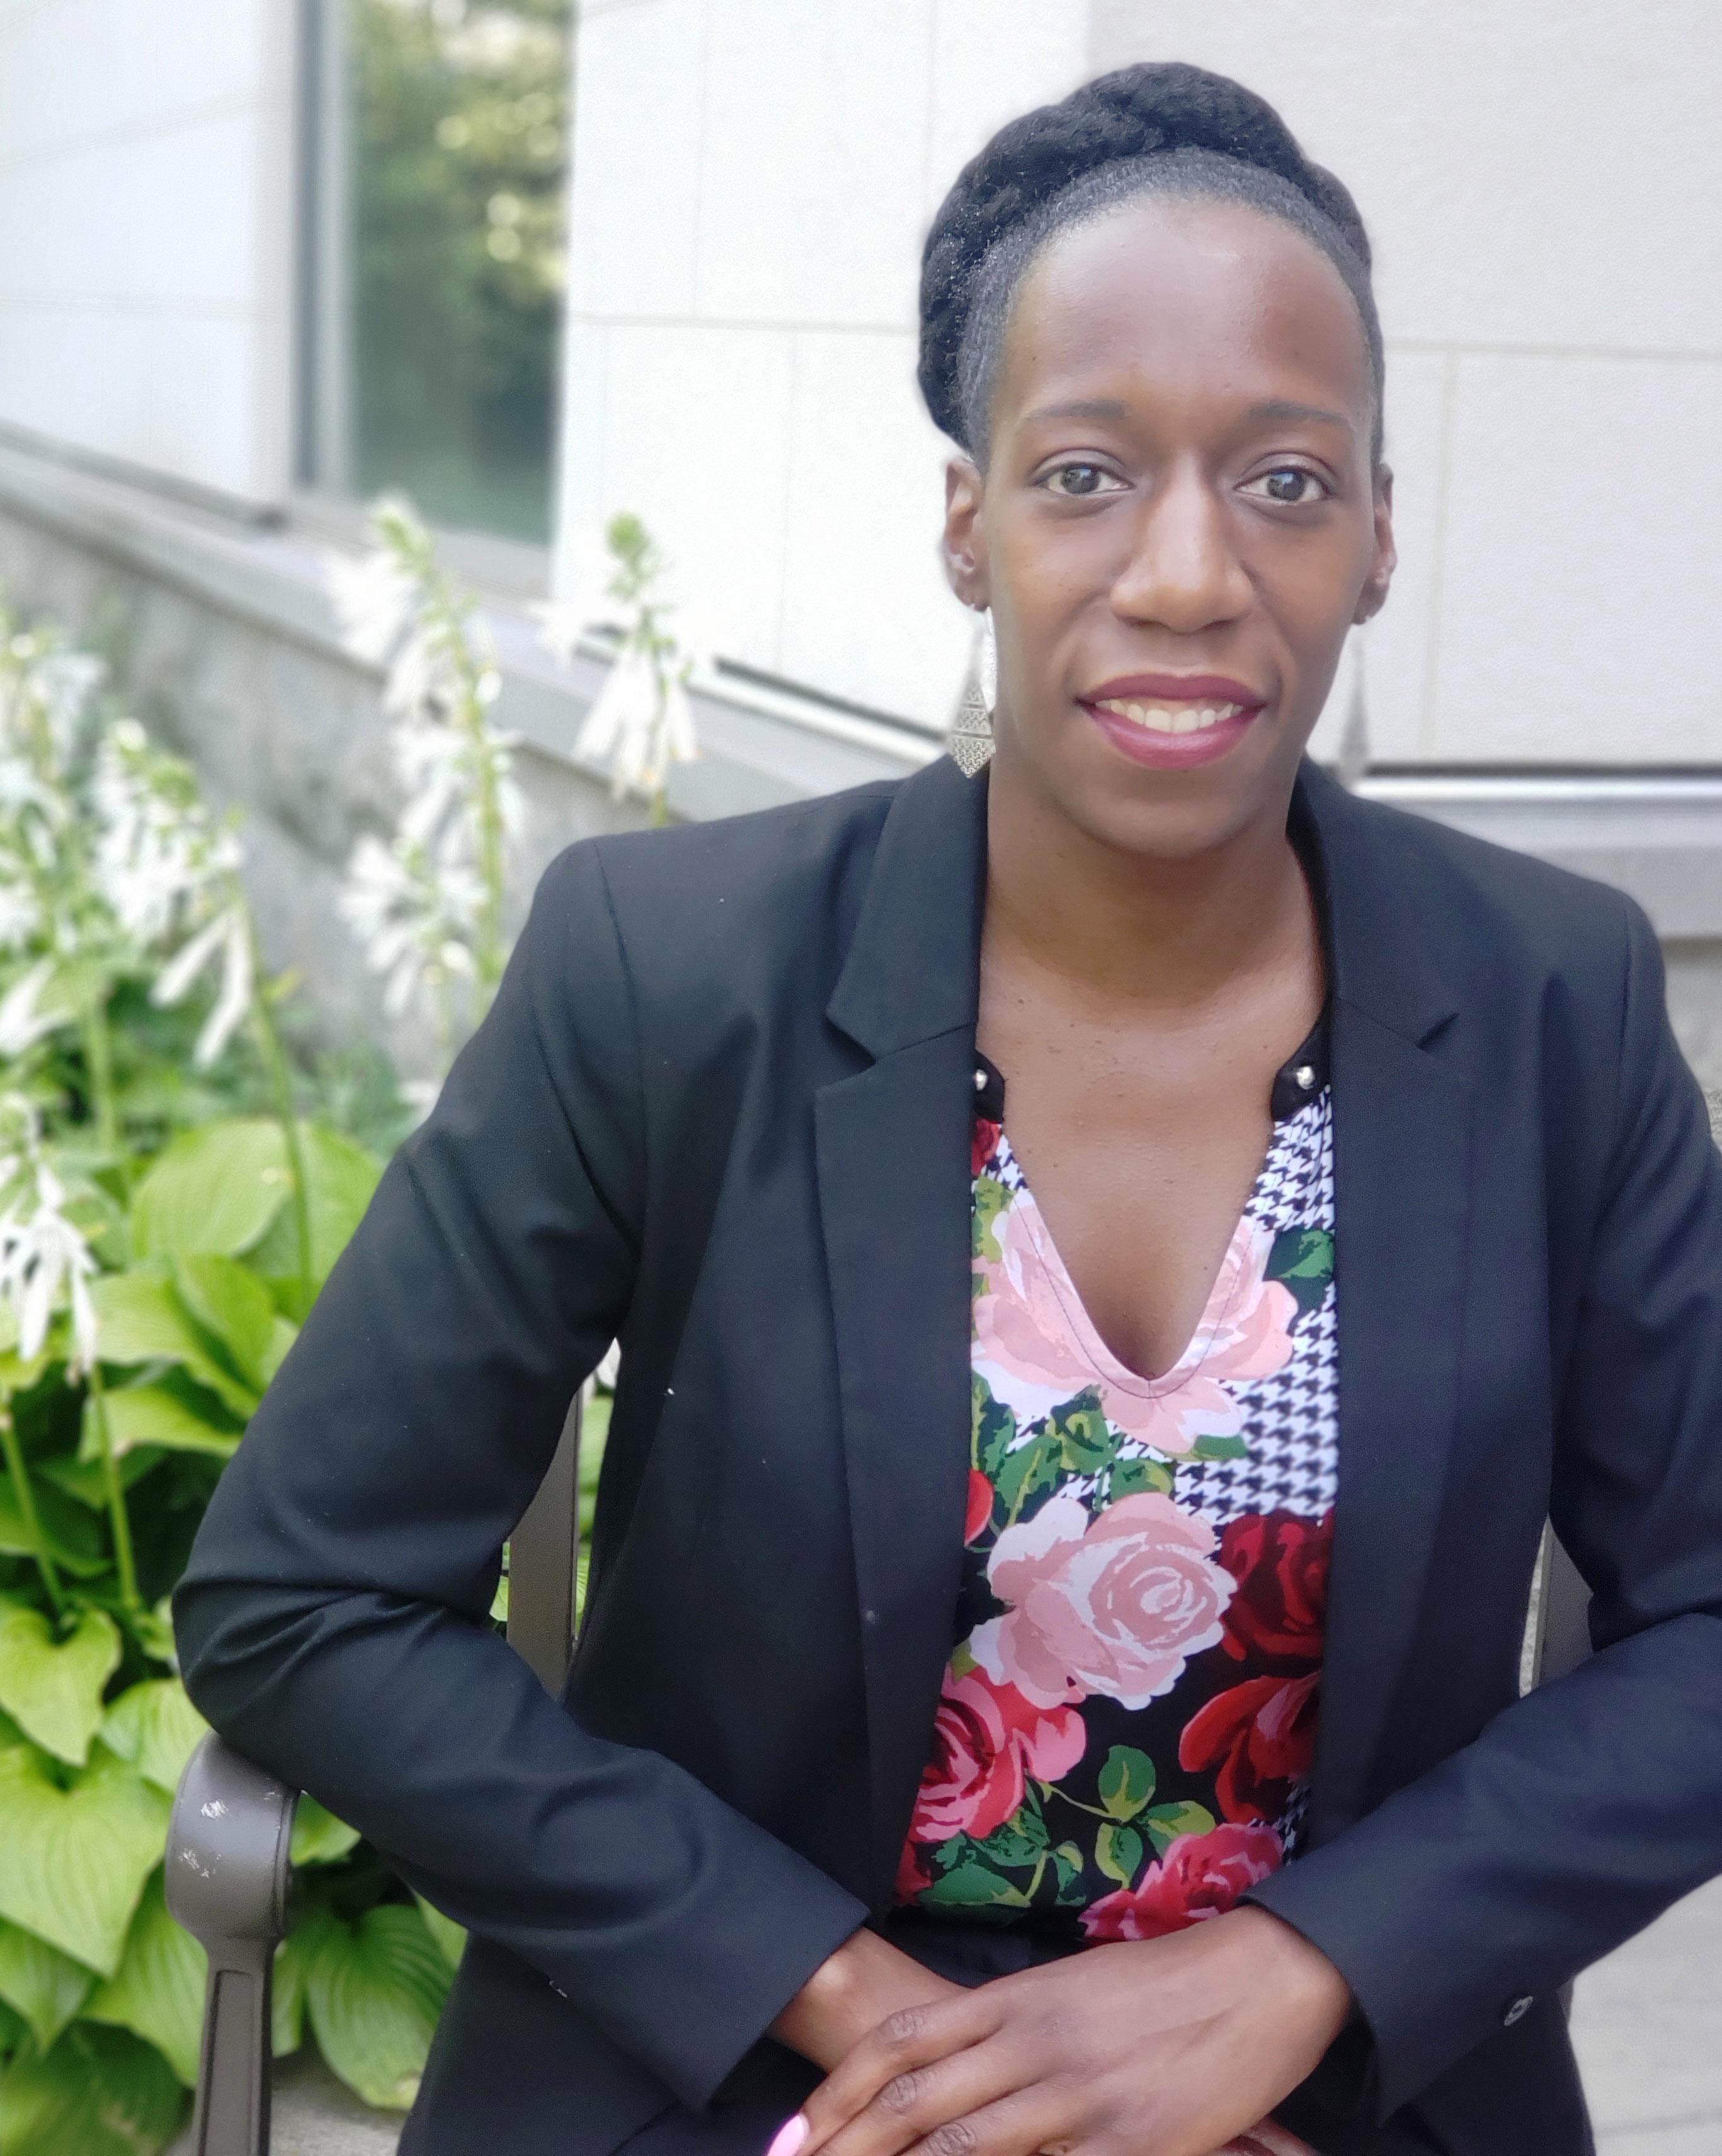 Jamilah Greenidge, Wartburg's Director of Admissions